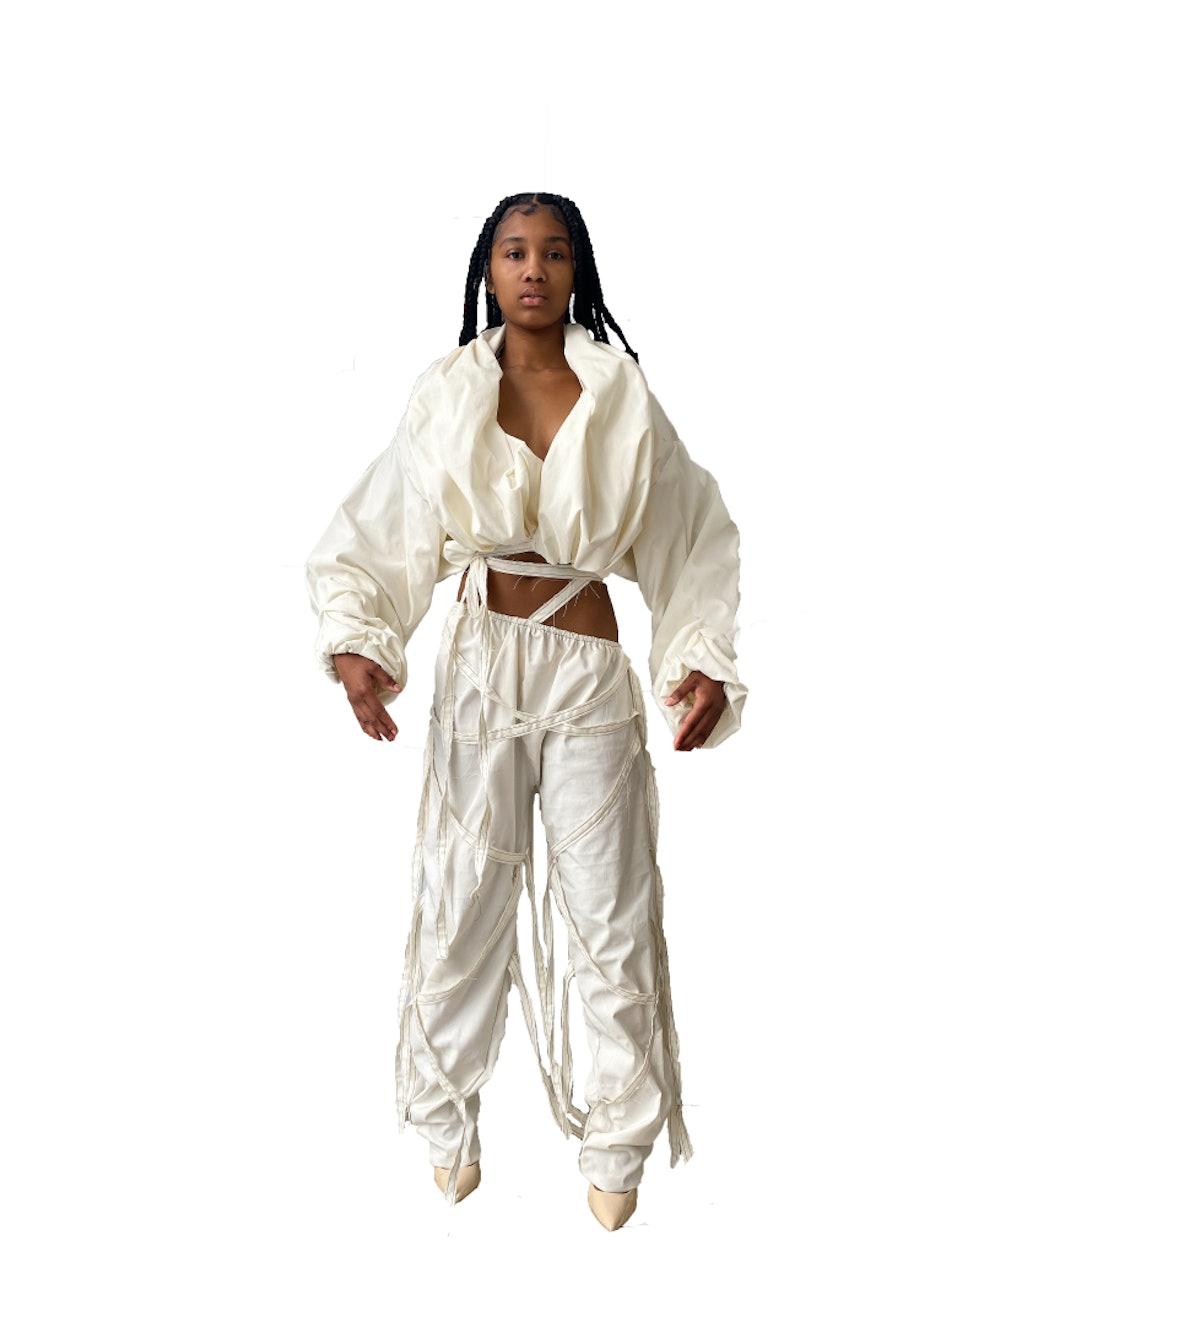 TLZ L'Femme Ivory Denim Strap Trouser